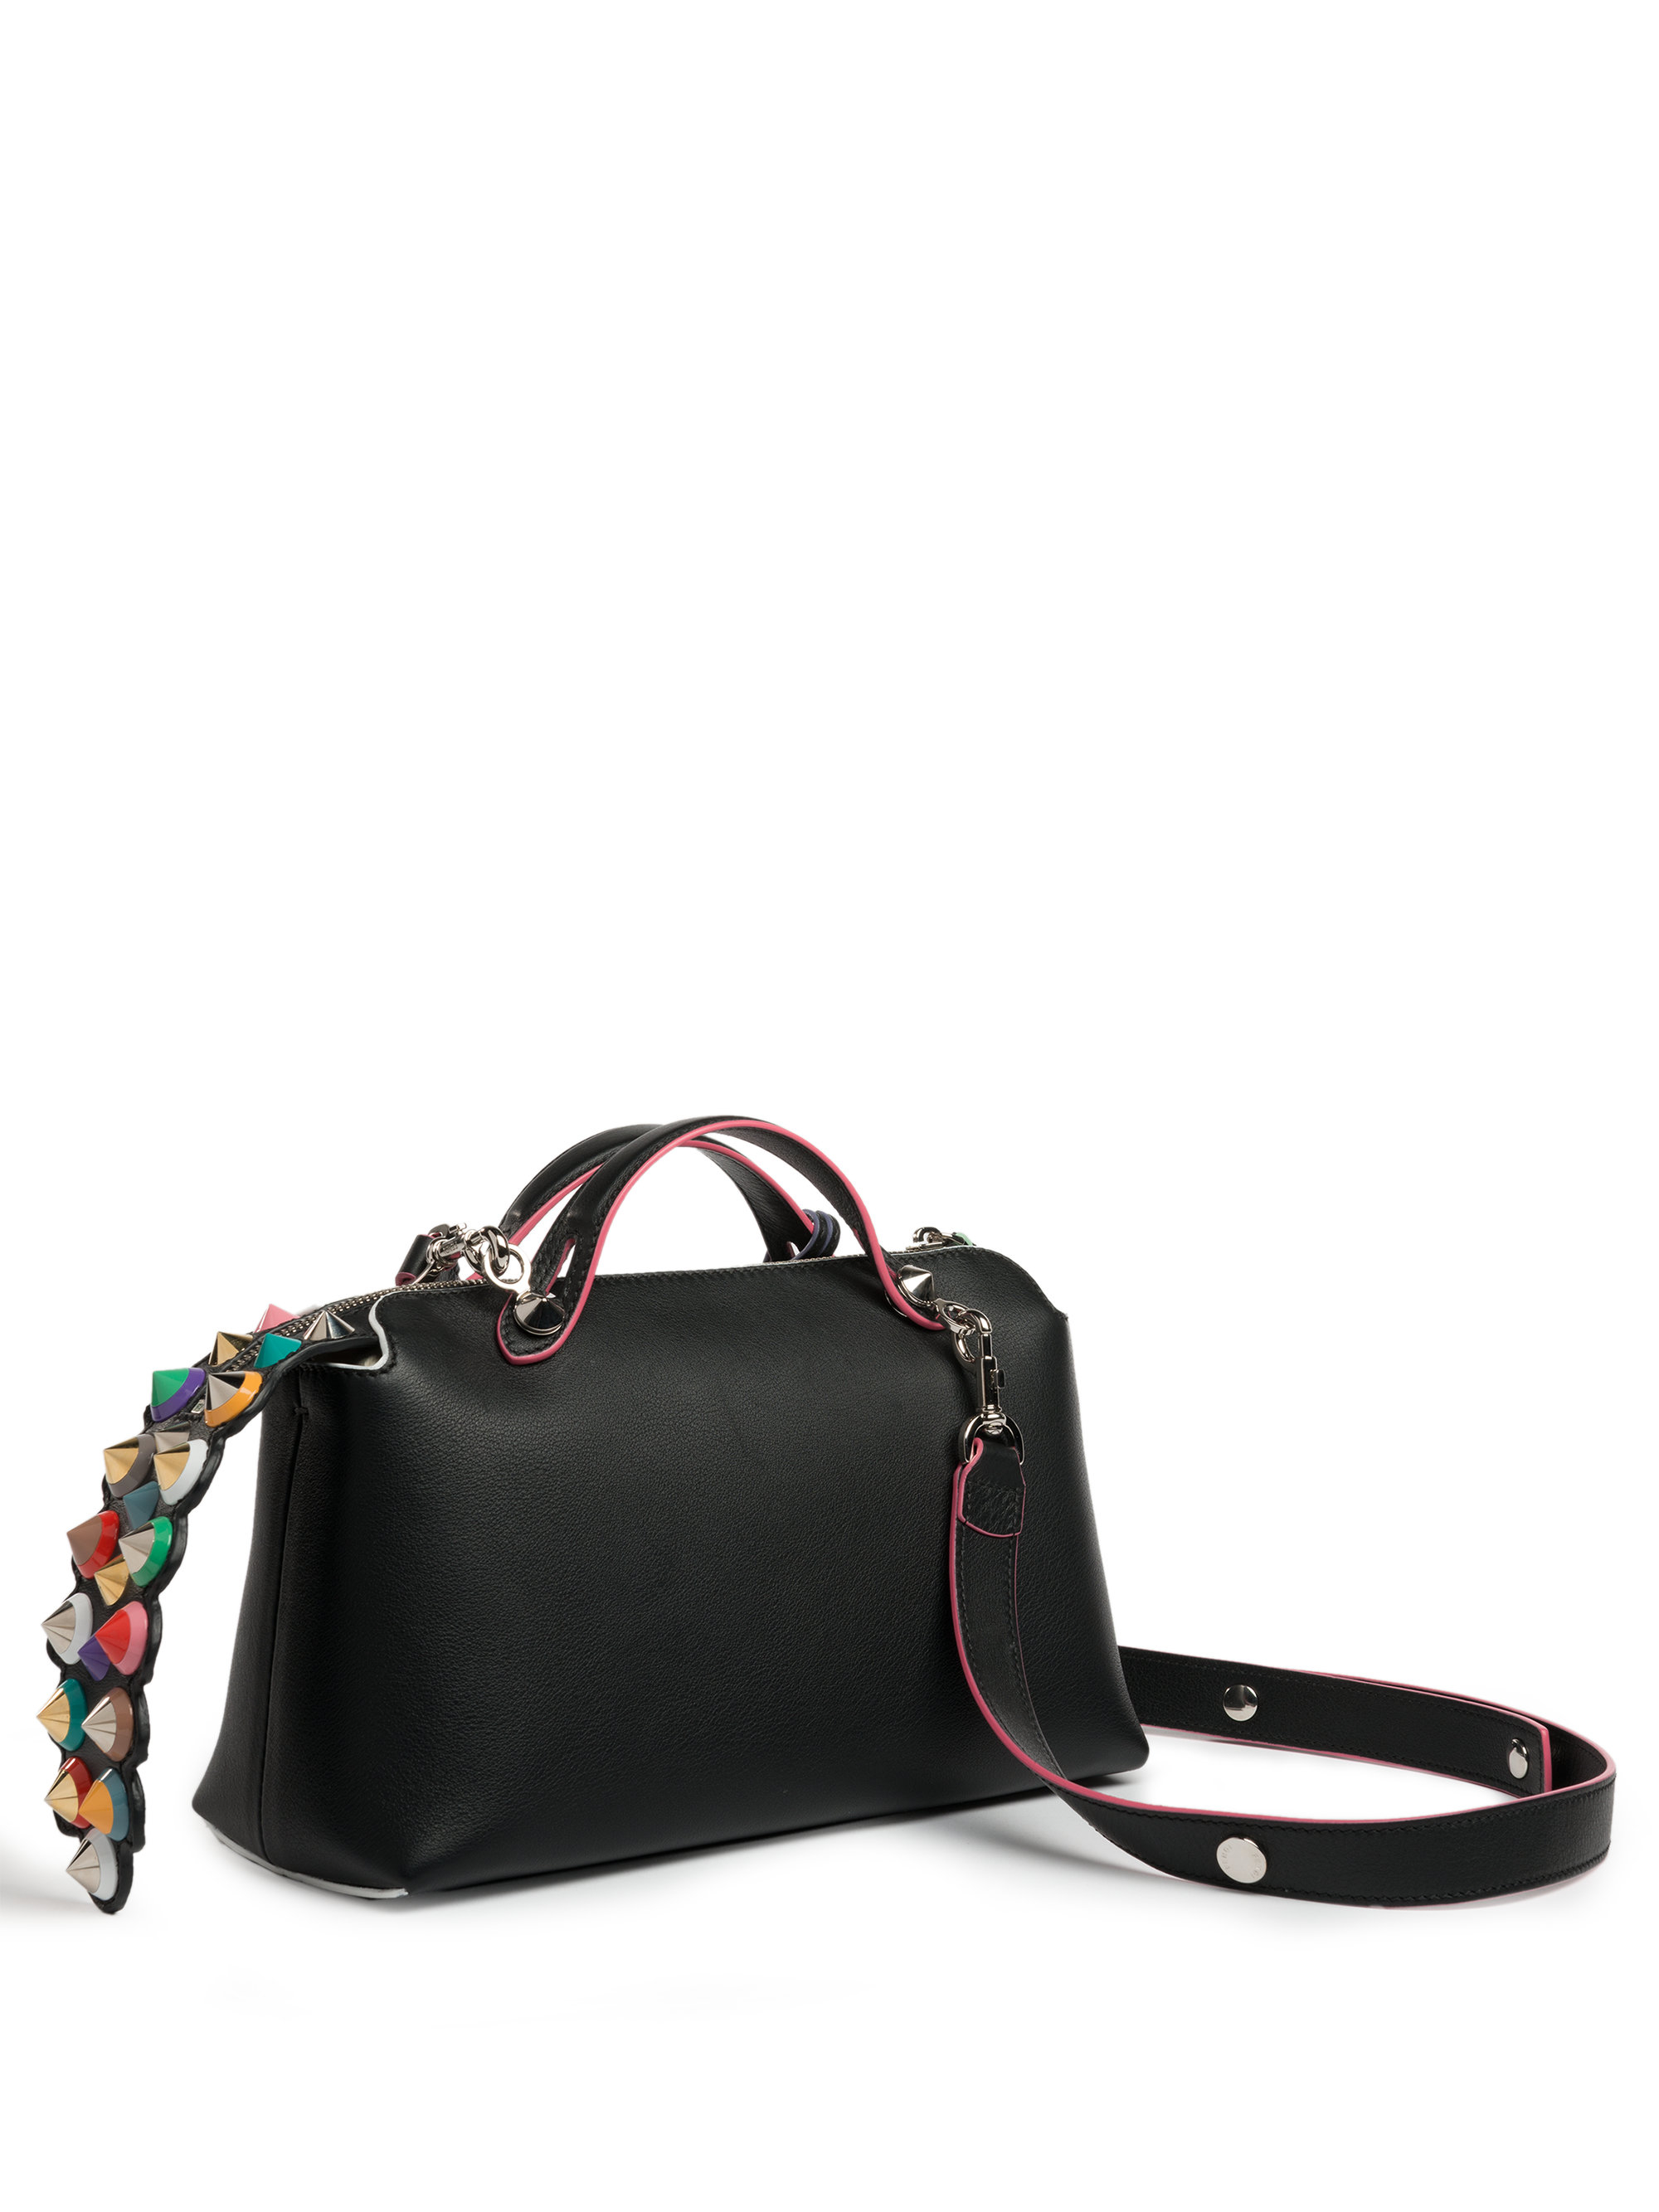 Fendi Handbag By The Way